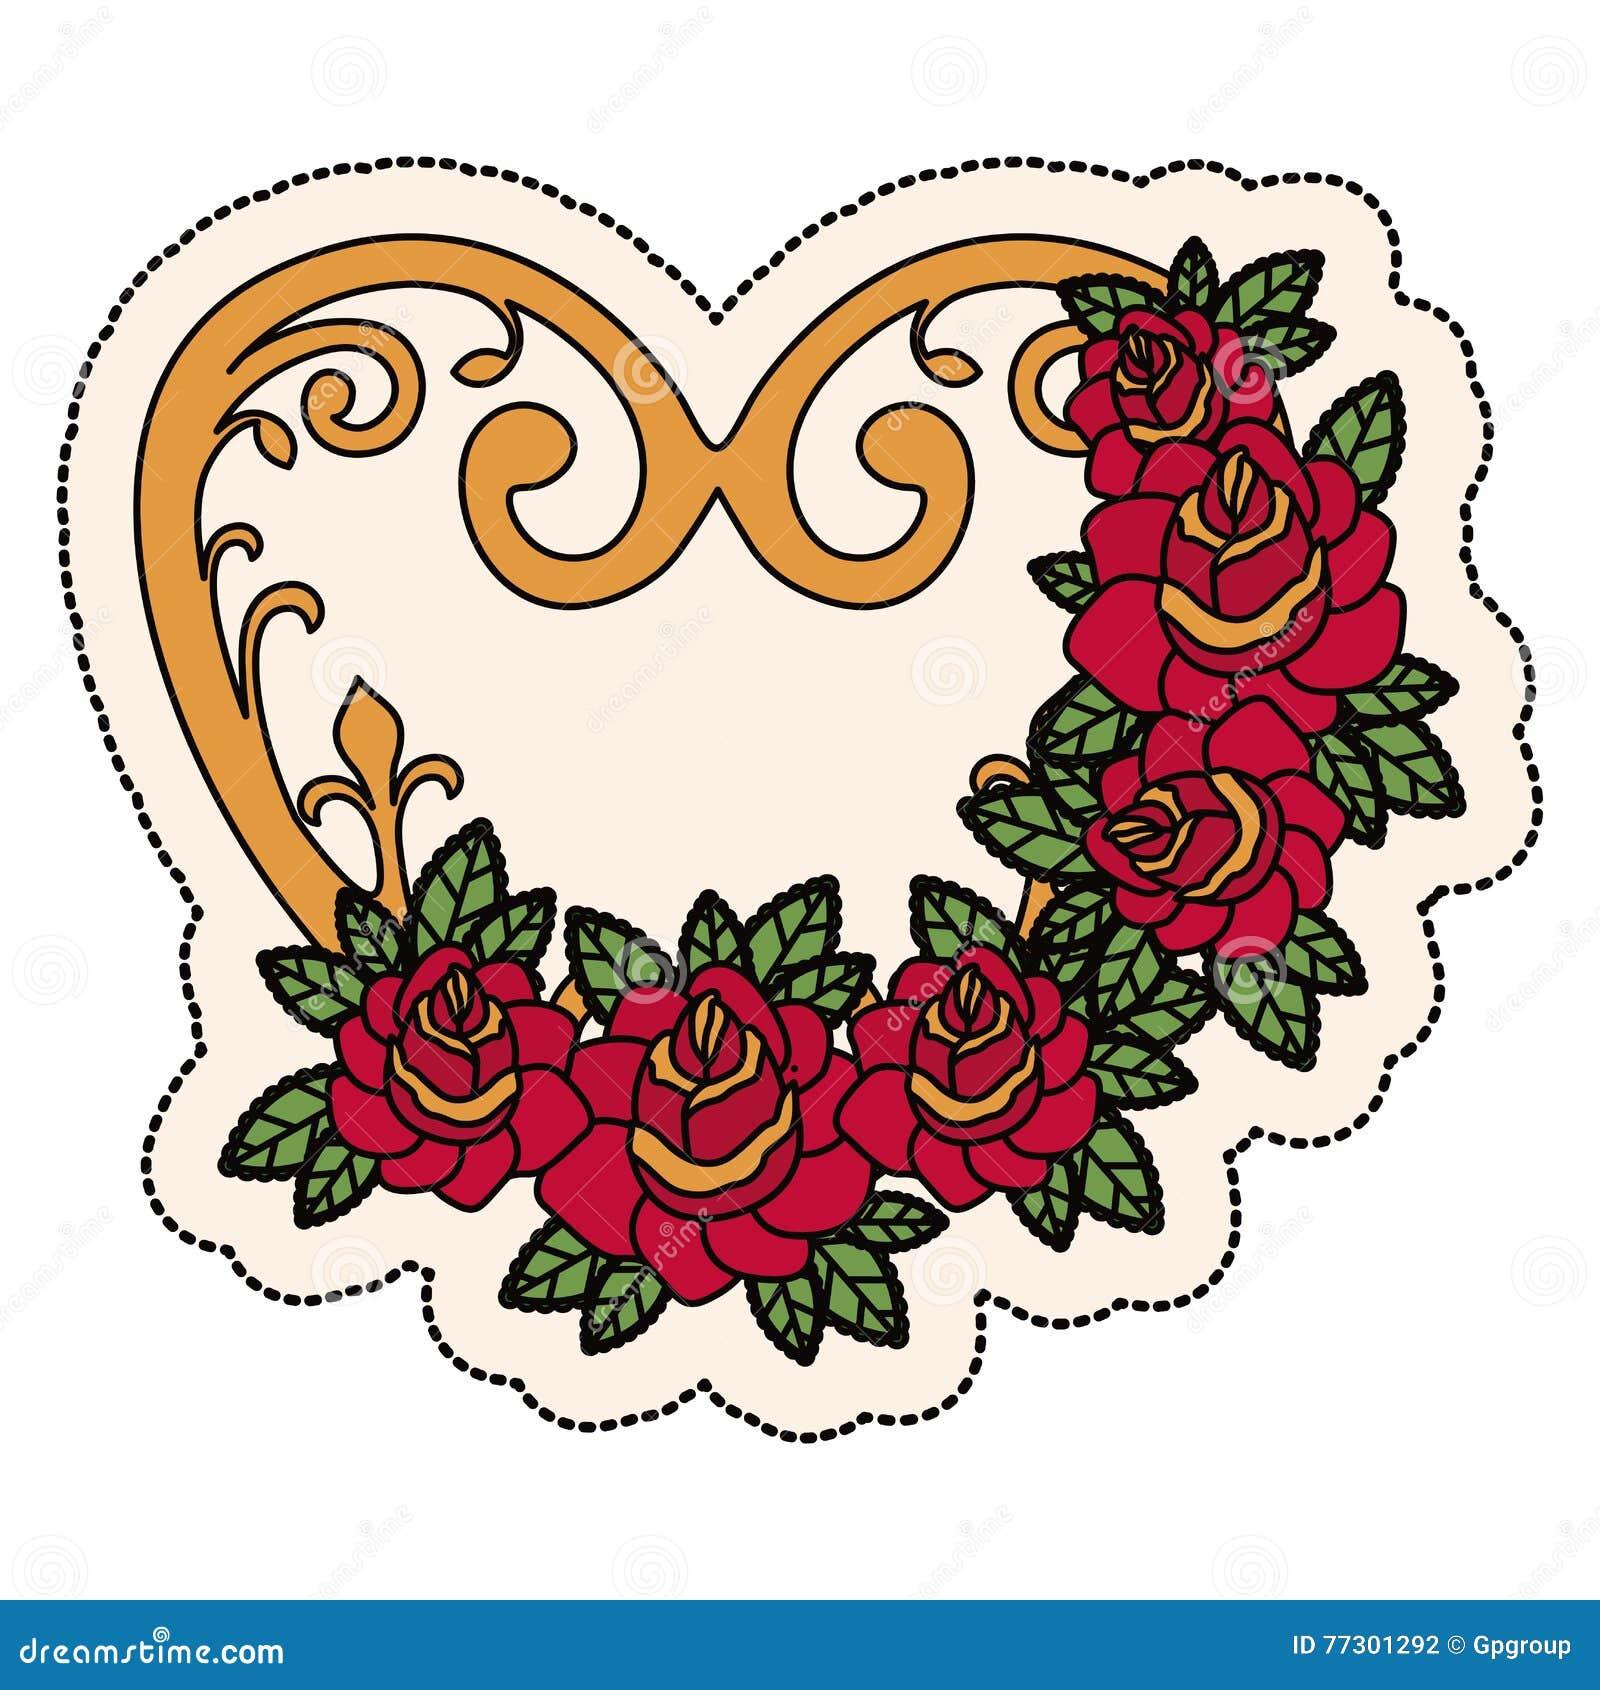 Дизайн формы сердца